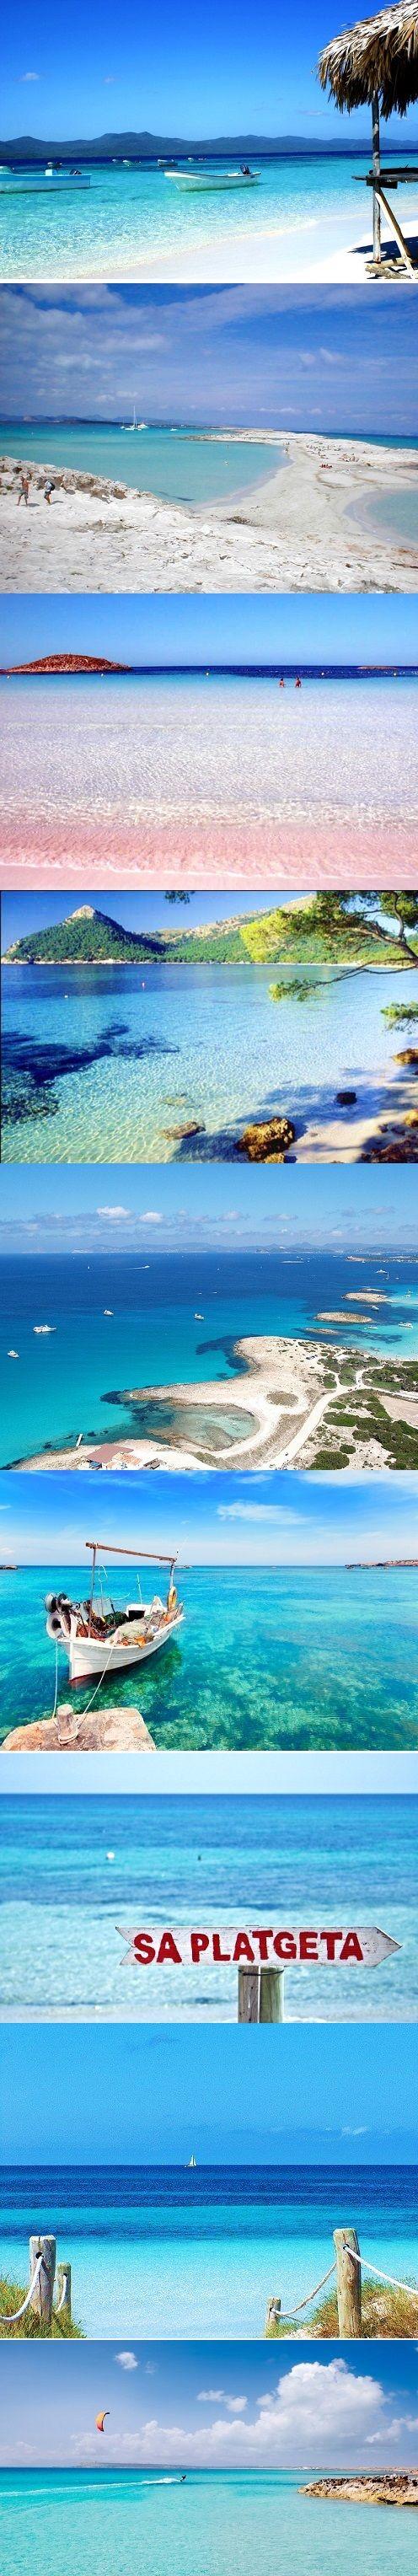 #zimmermanngoesto Formentera Beaches